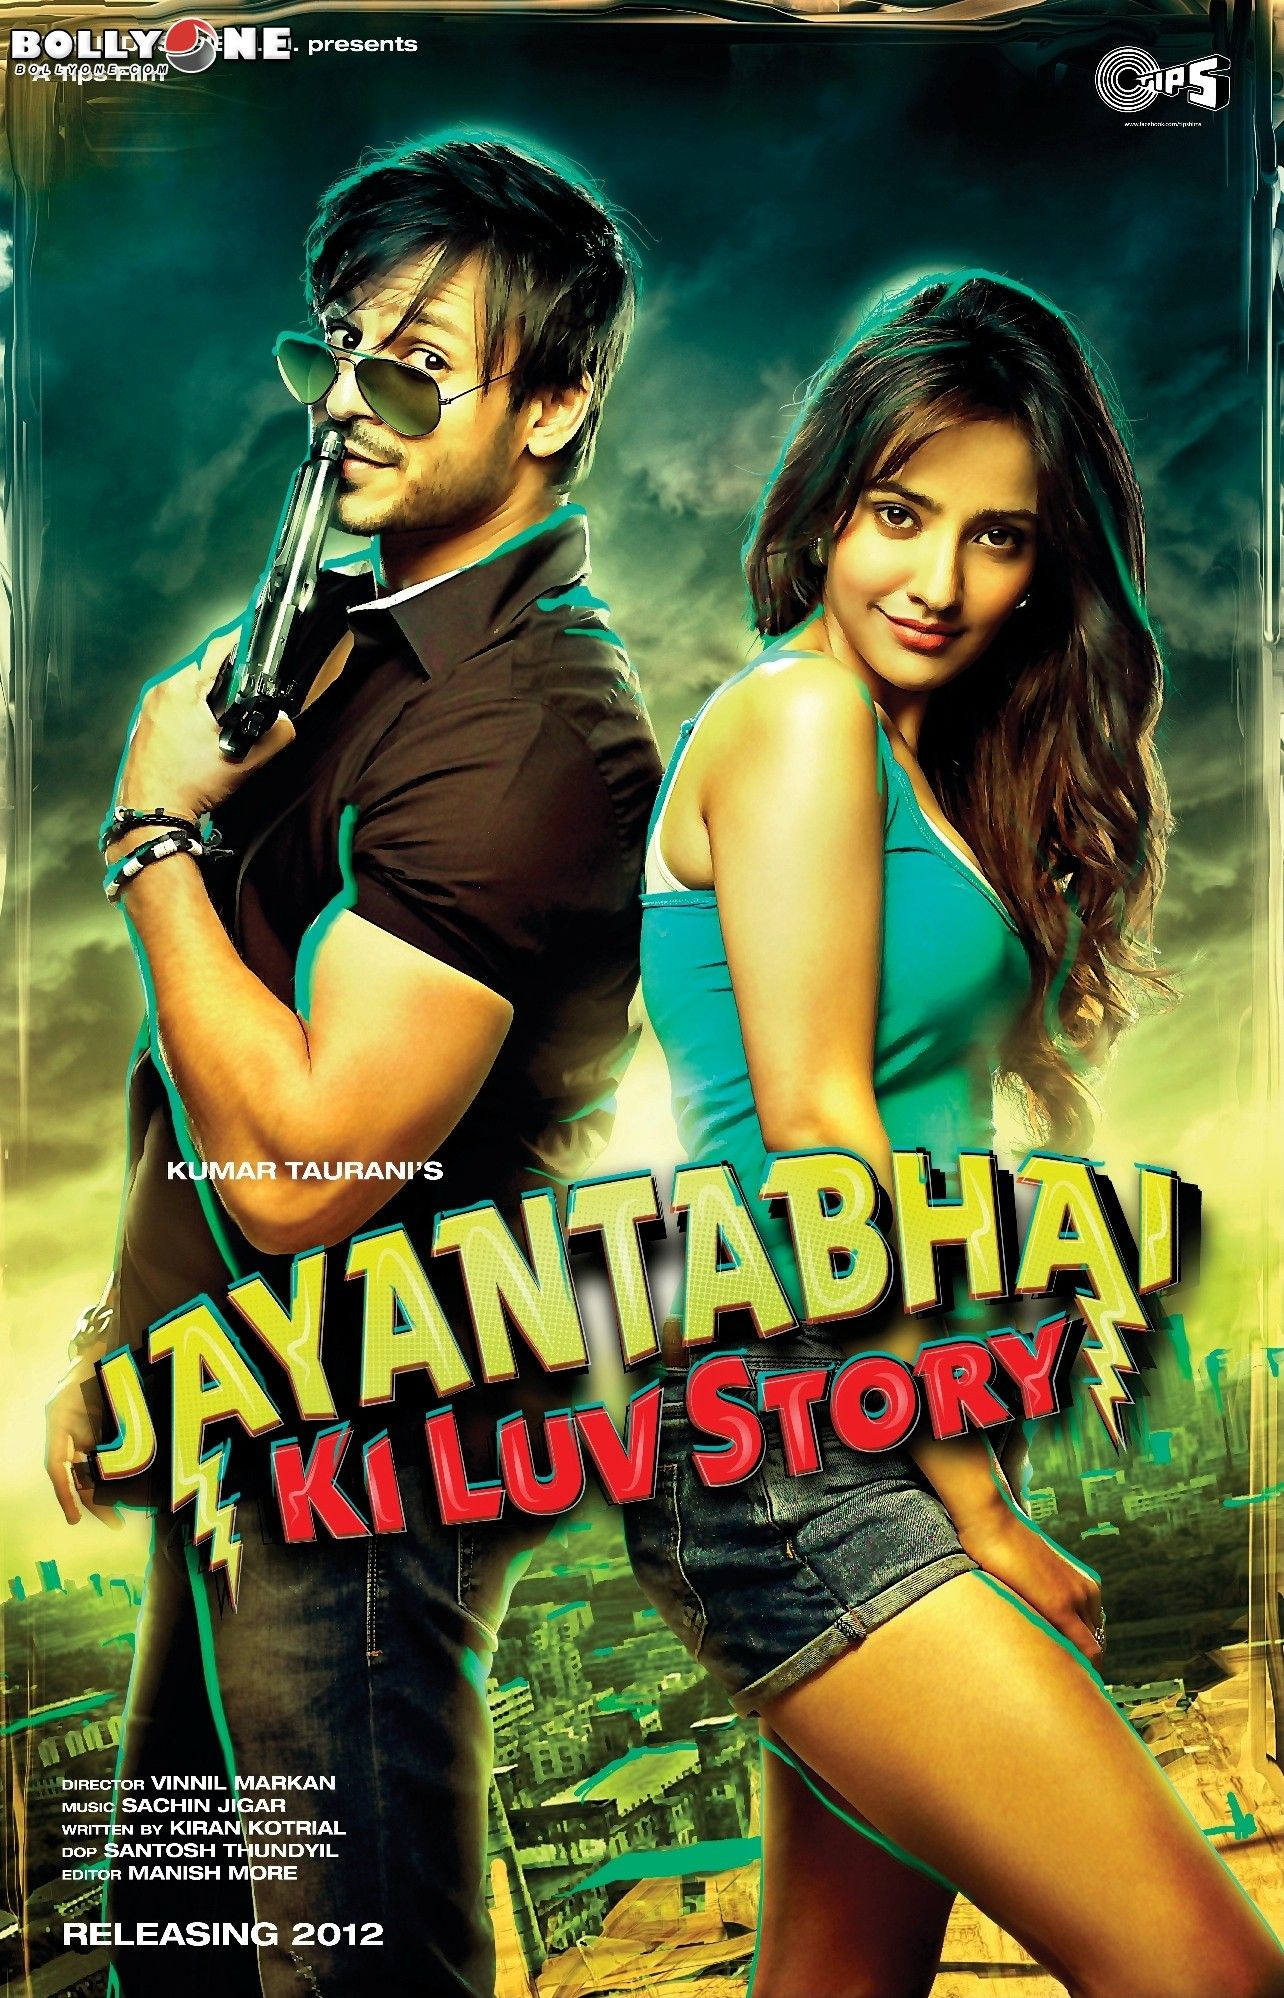 Jayantabhai ki luv story full movie download 720p bluray